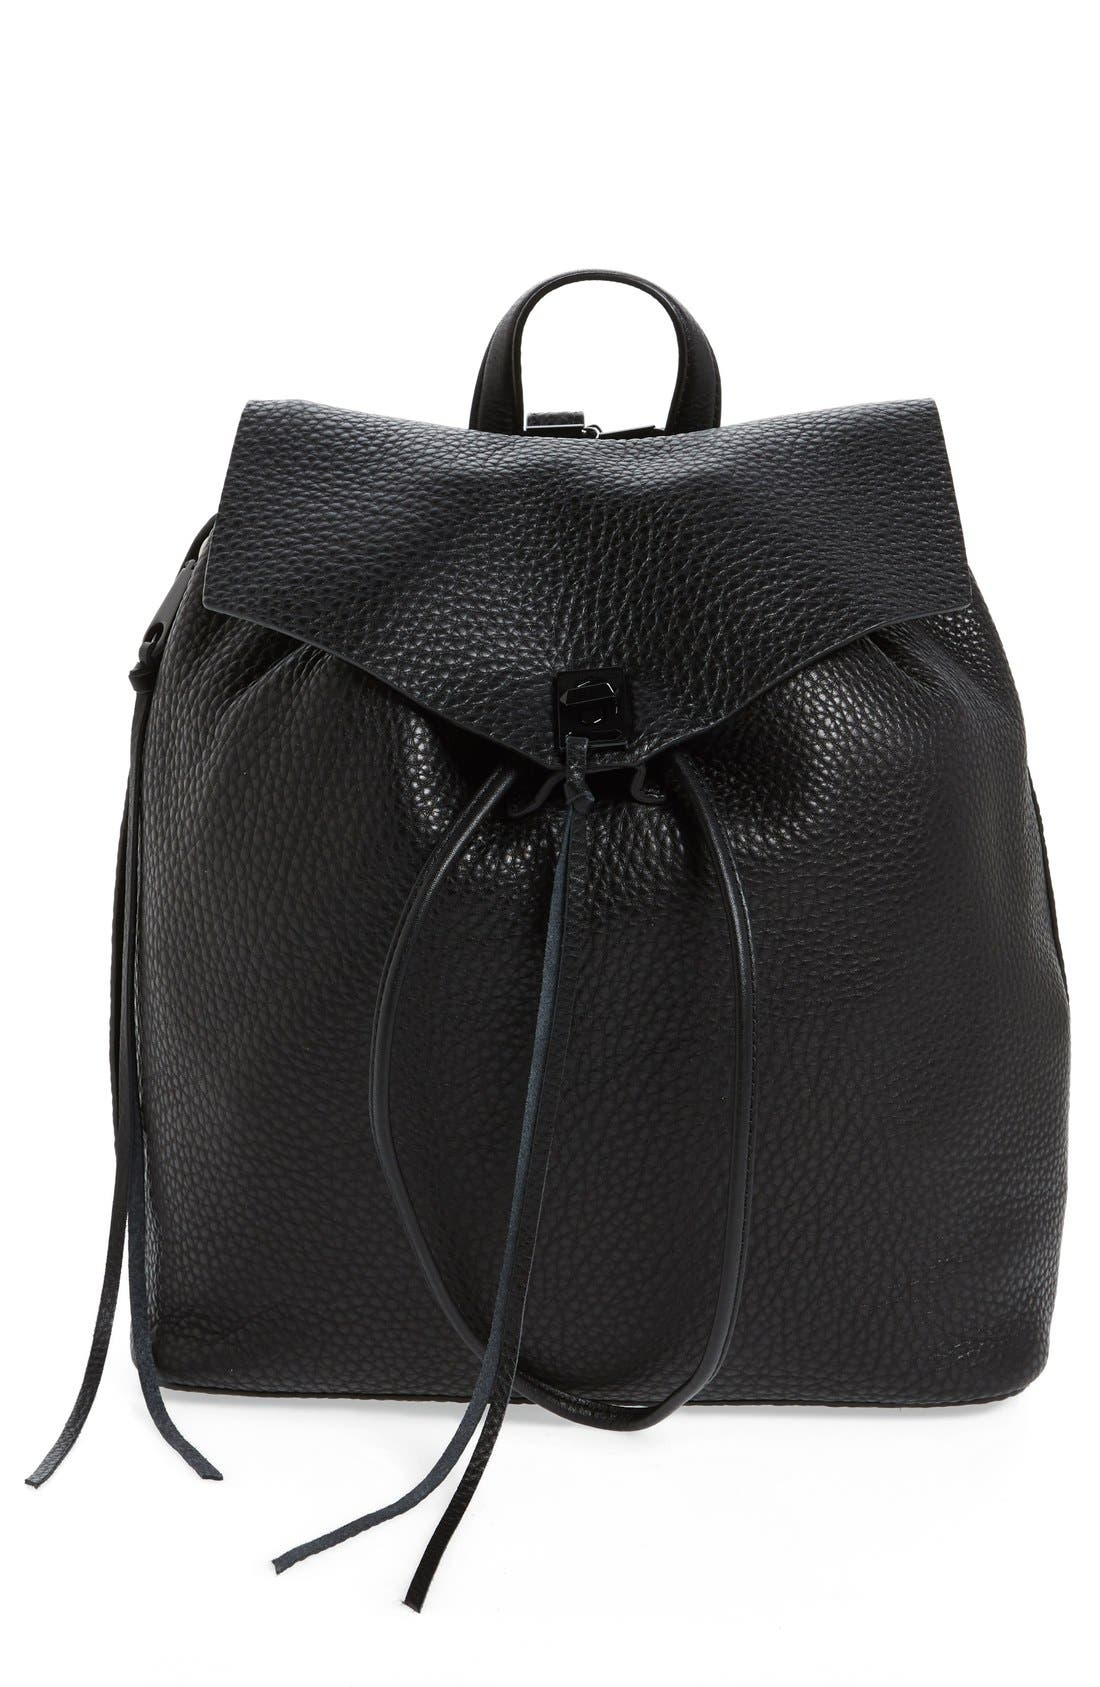 Alternate Image 1 Selected - Rebecca Minkoff Darren Leather Backpack